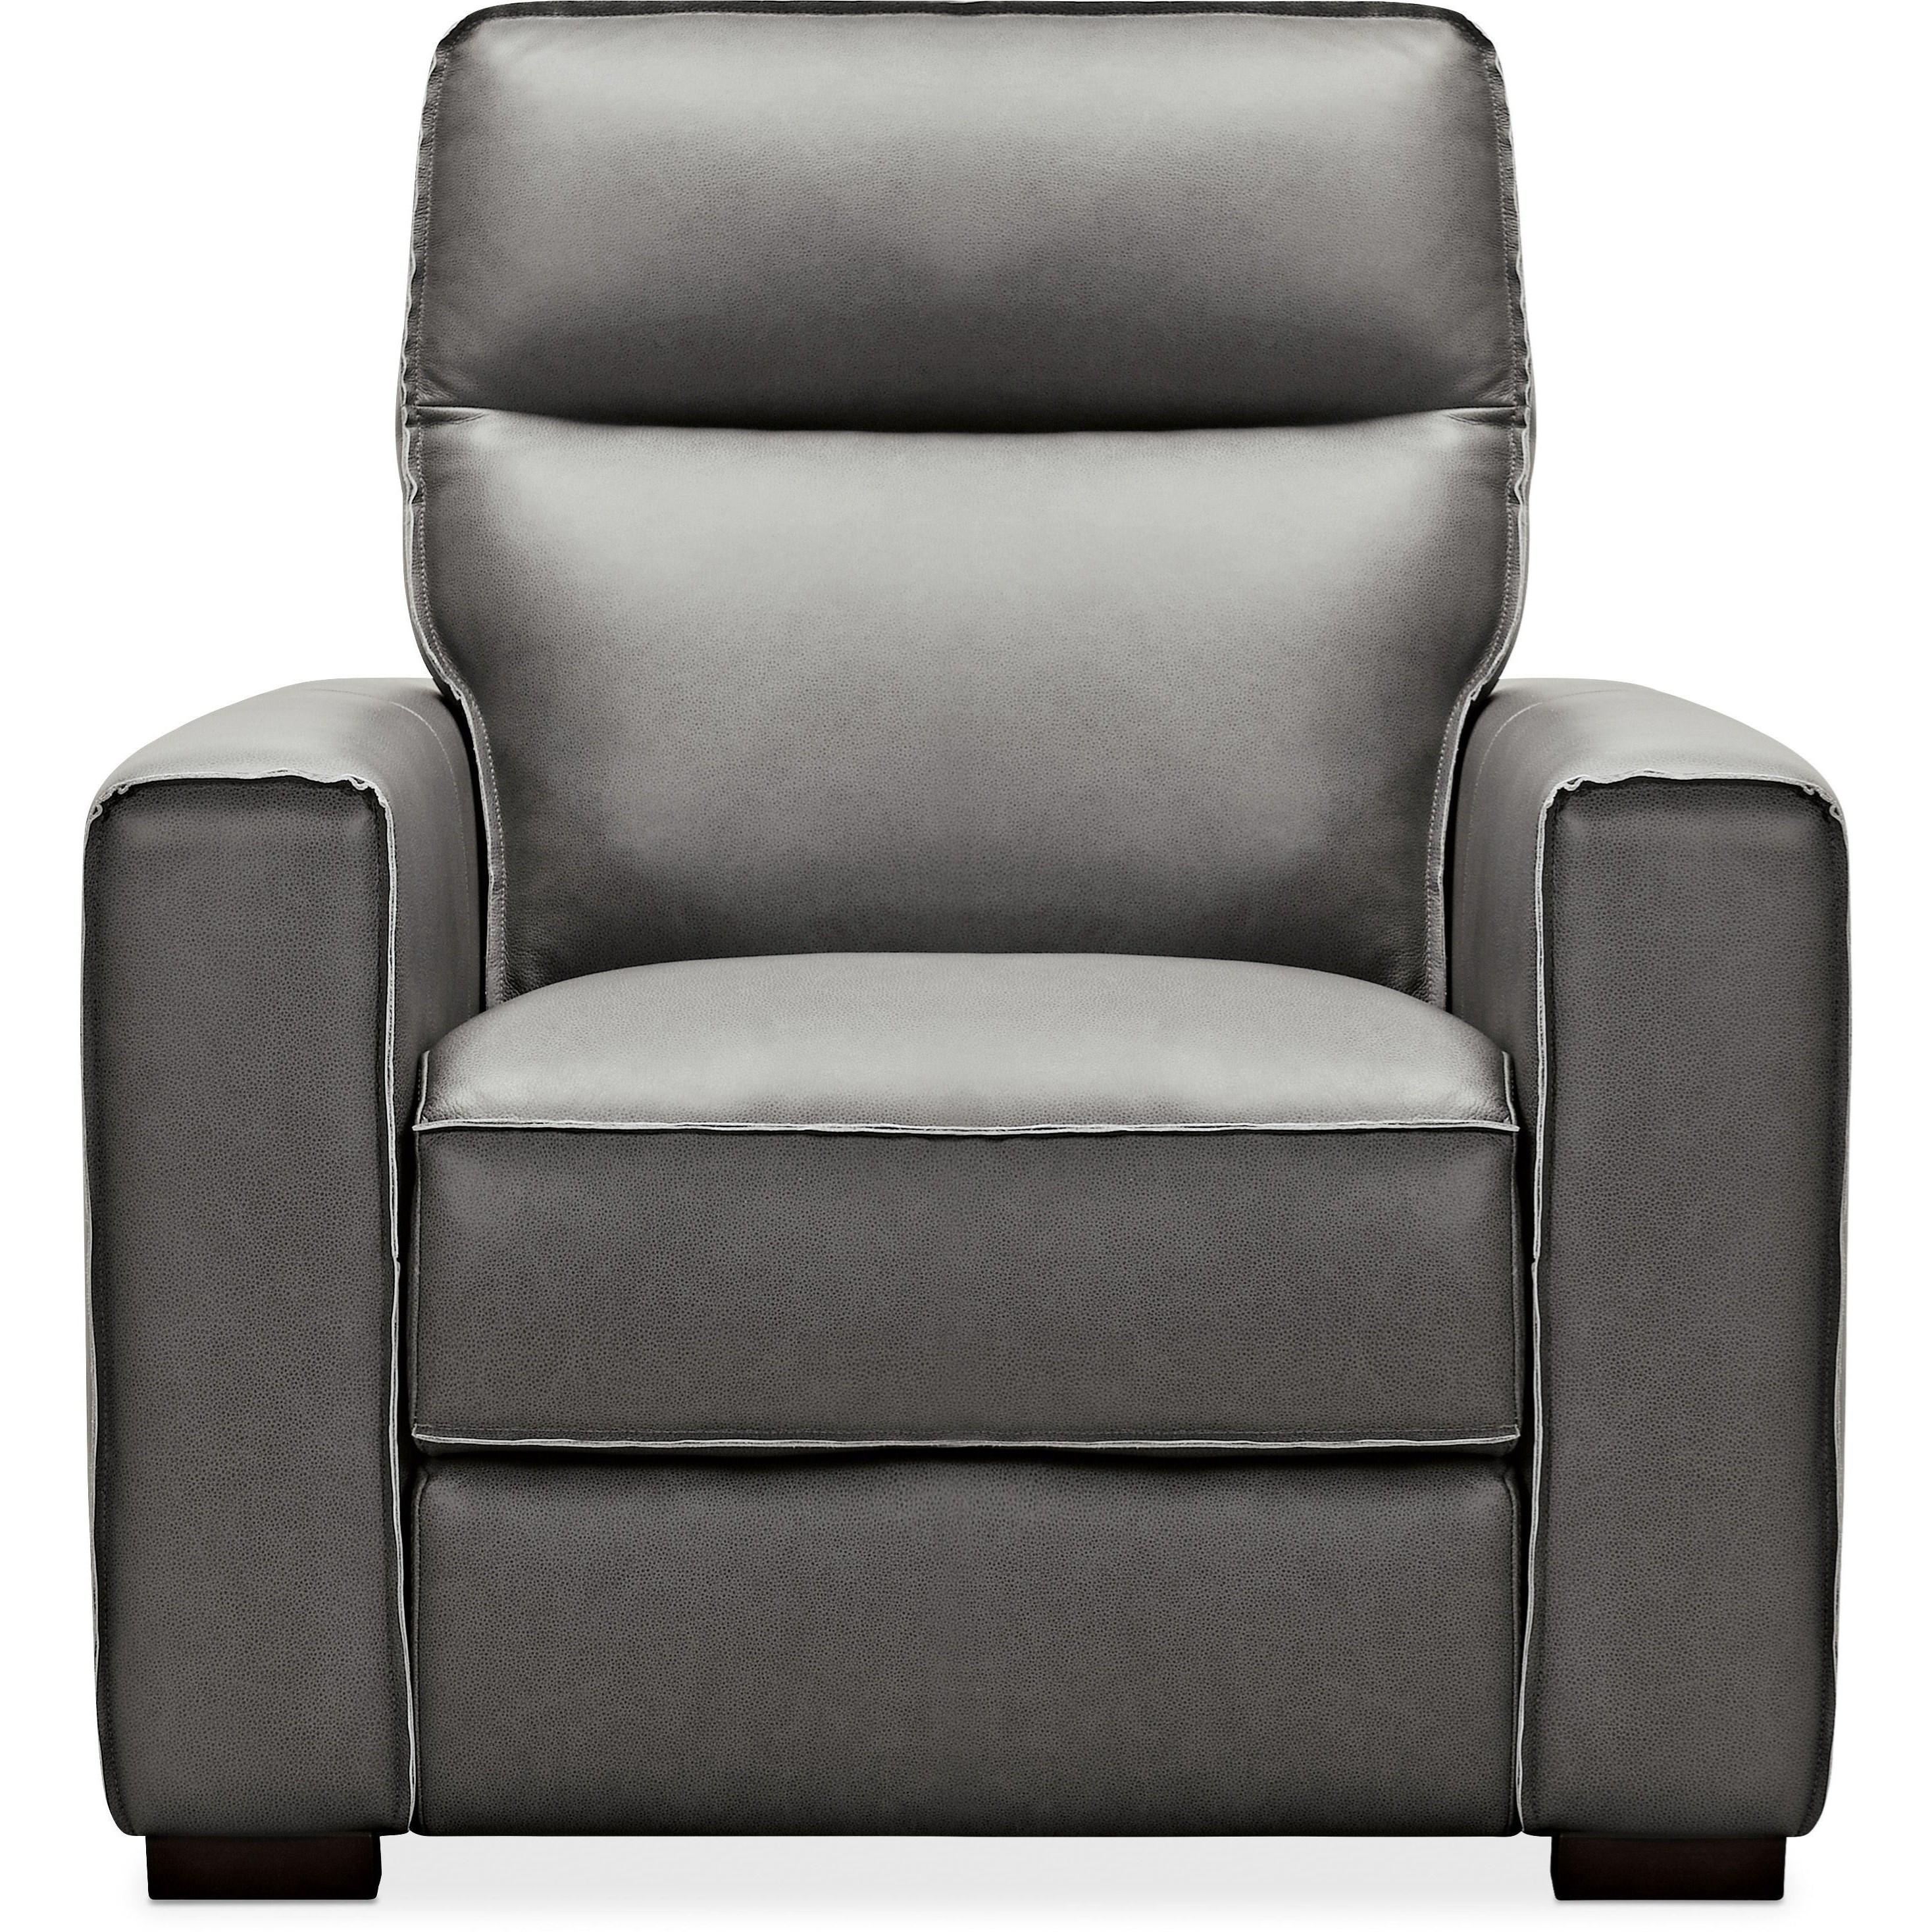 Braeburn Leather Recliner w/ Power Headrest by Hooker Furniture at Miller Waldrop Furniture and Decor